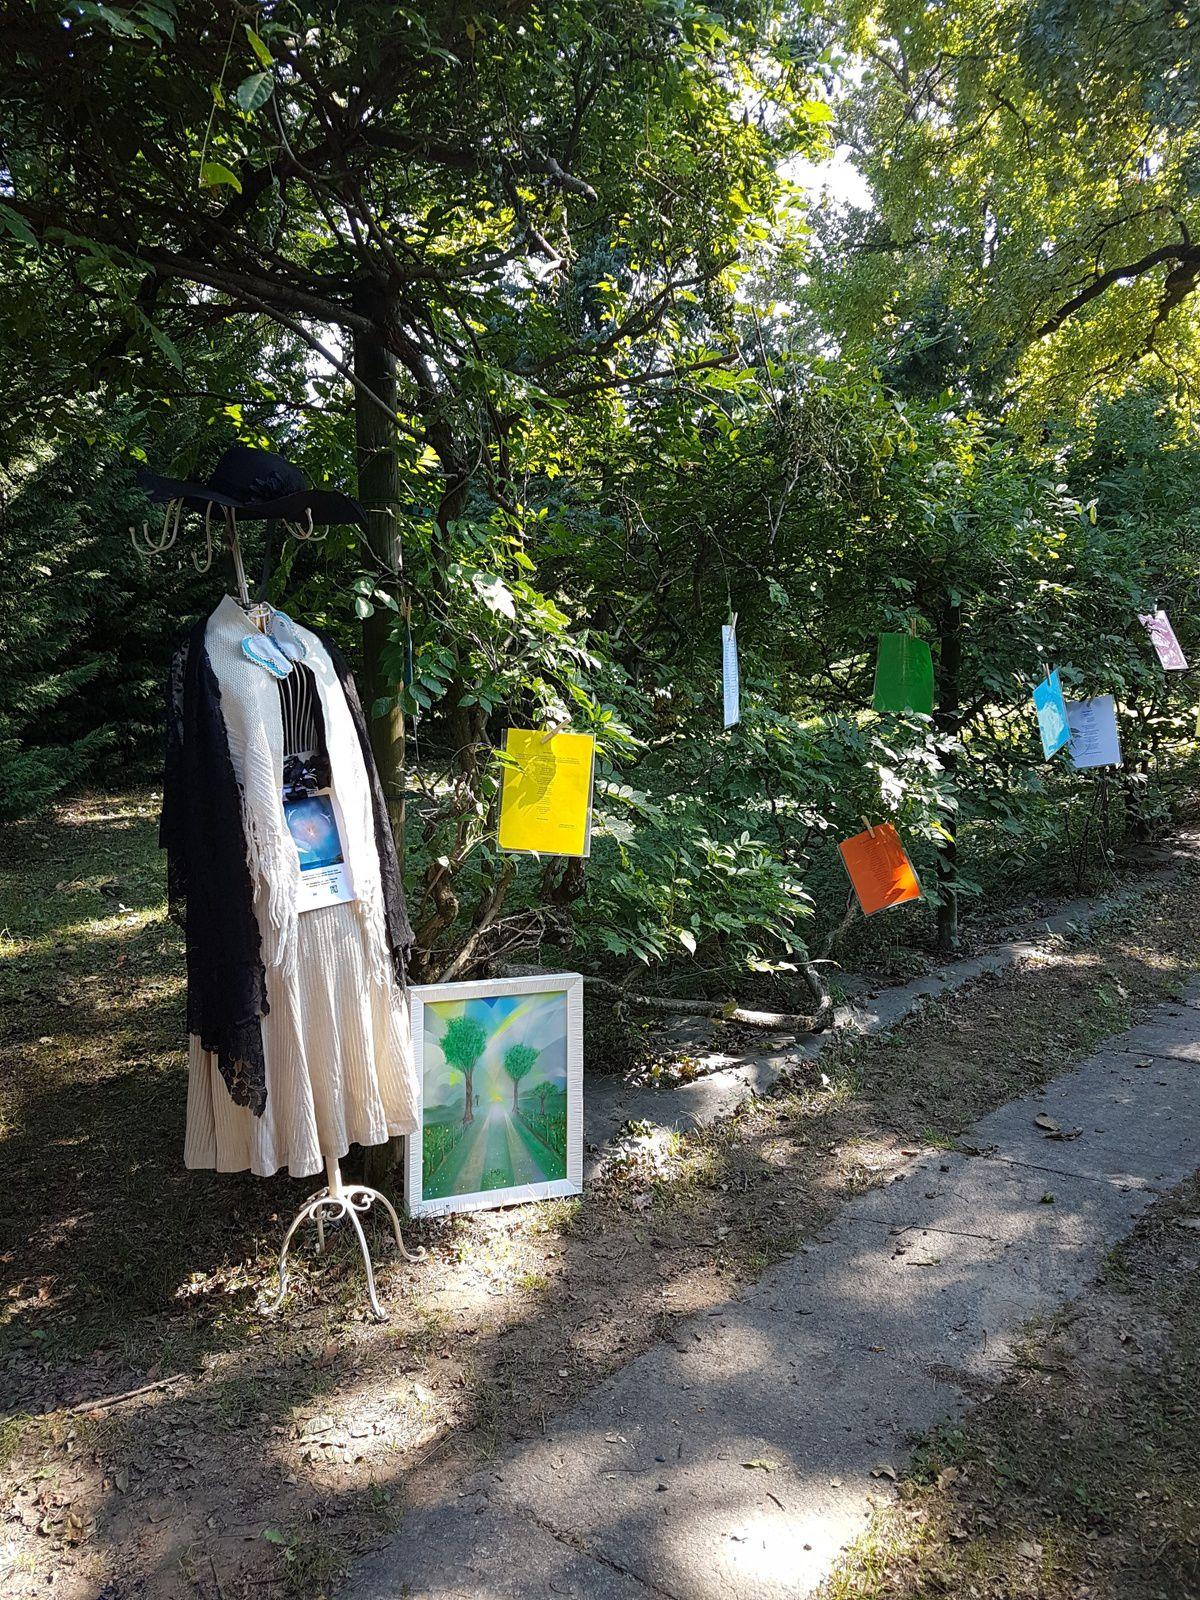 L'Art aux temps du Coronavirus - installation de l'artiste italienne Lidia Chiarelli, Agliè-Turin